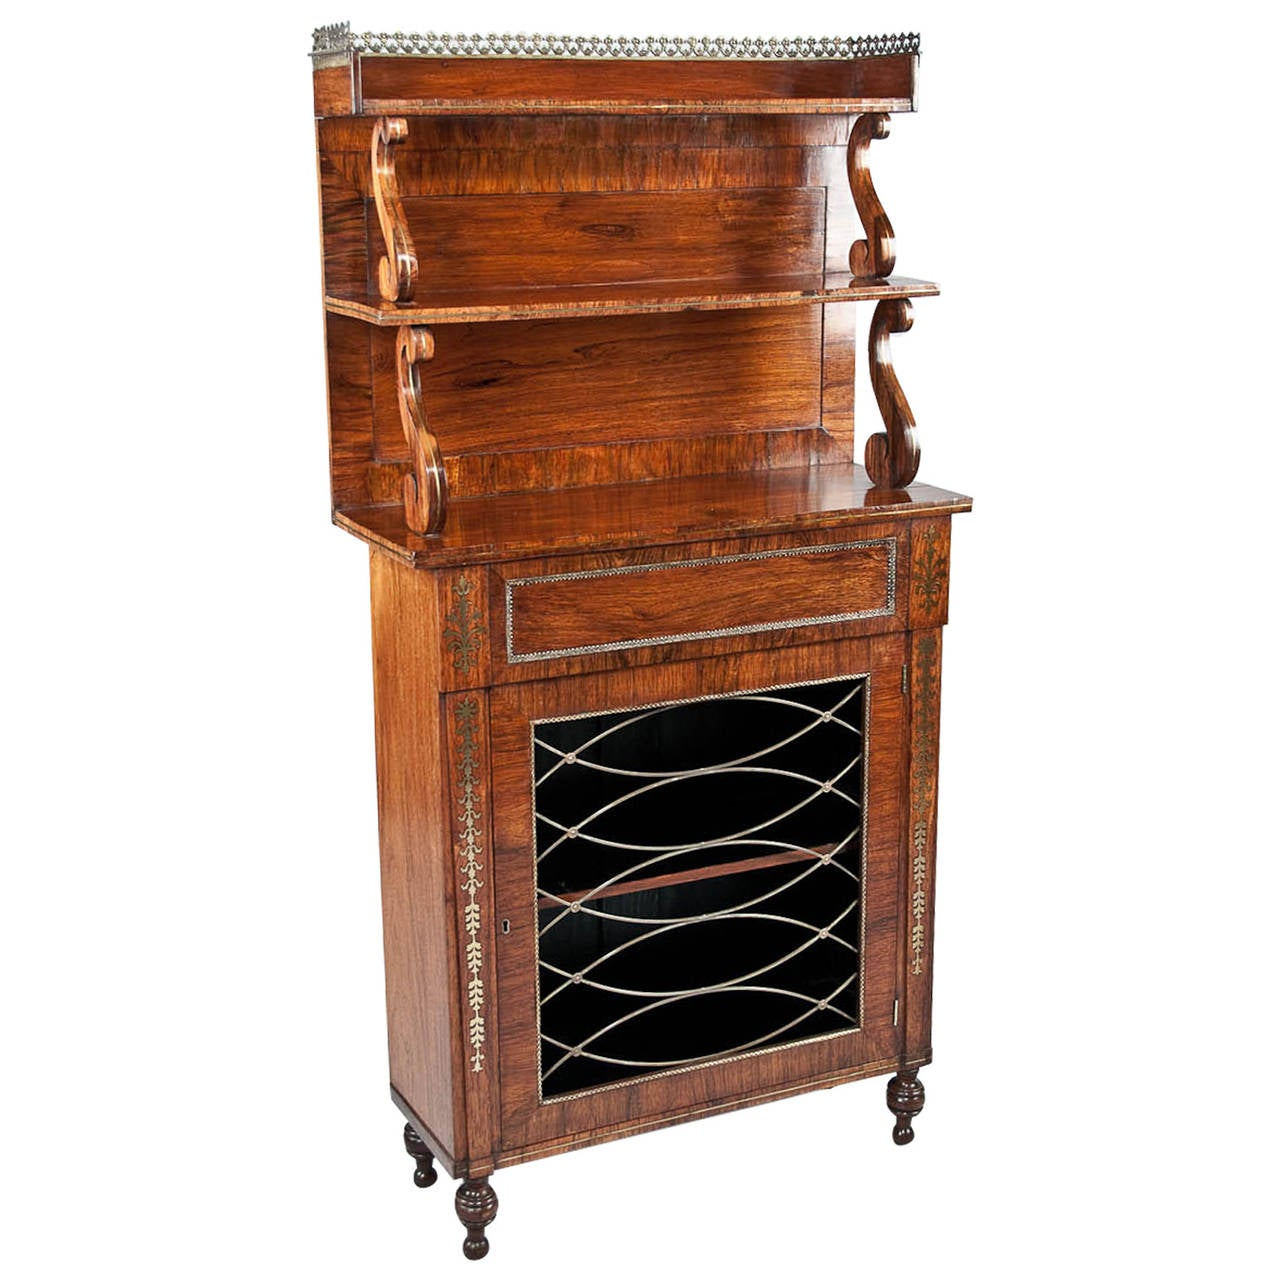 Regency Brass Inlaid Rosewood Chiffonier